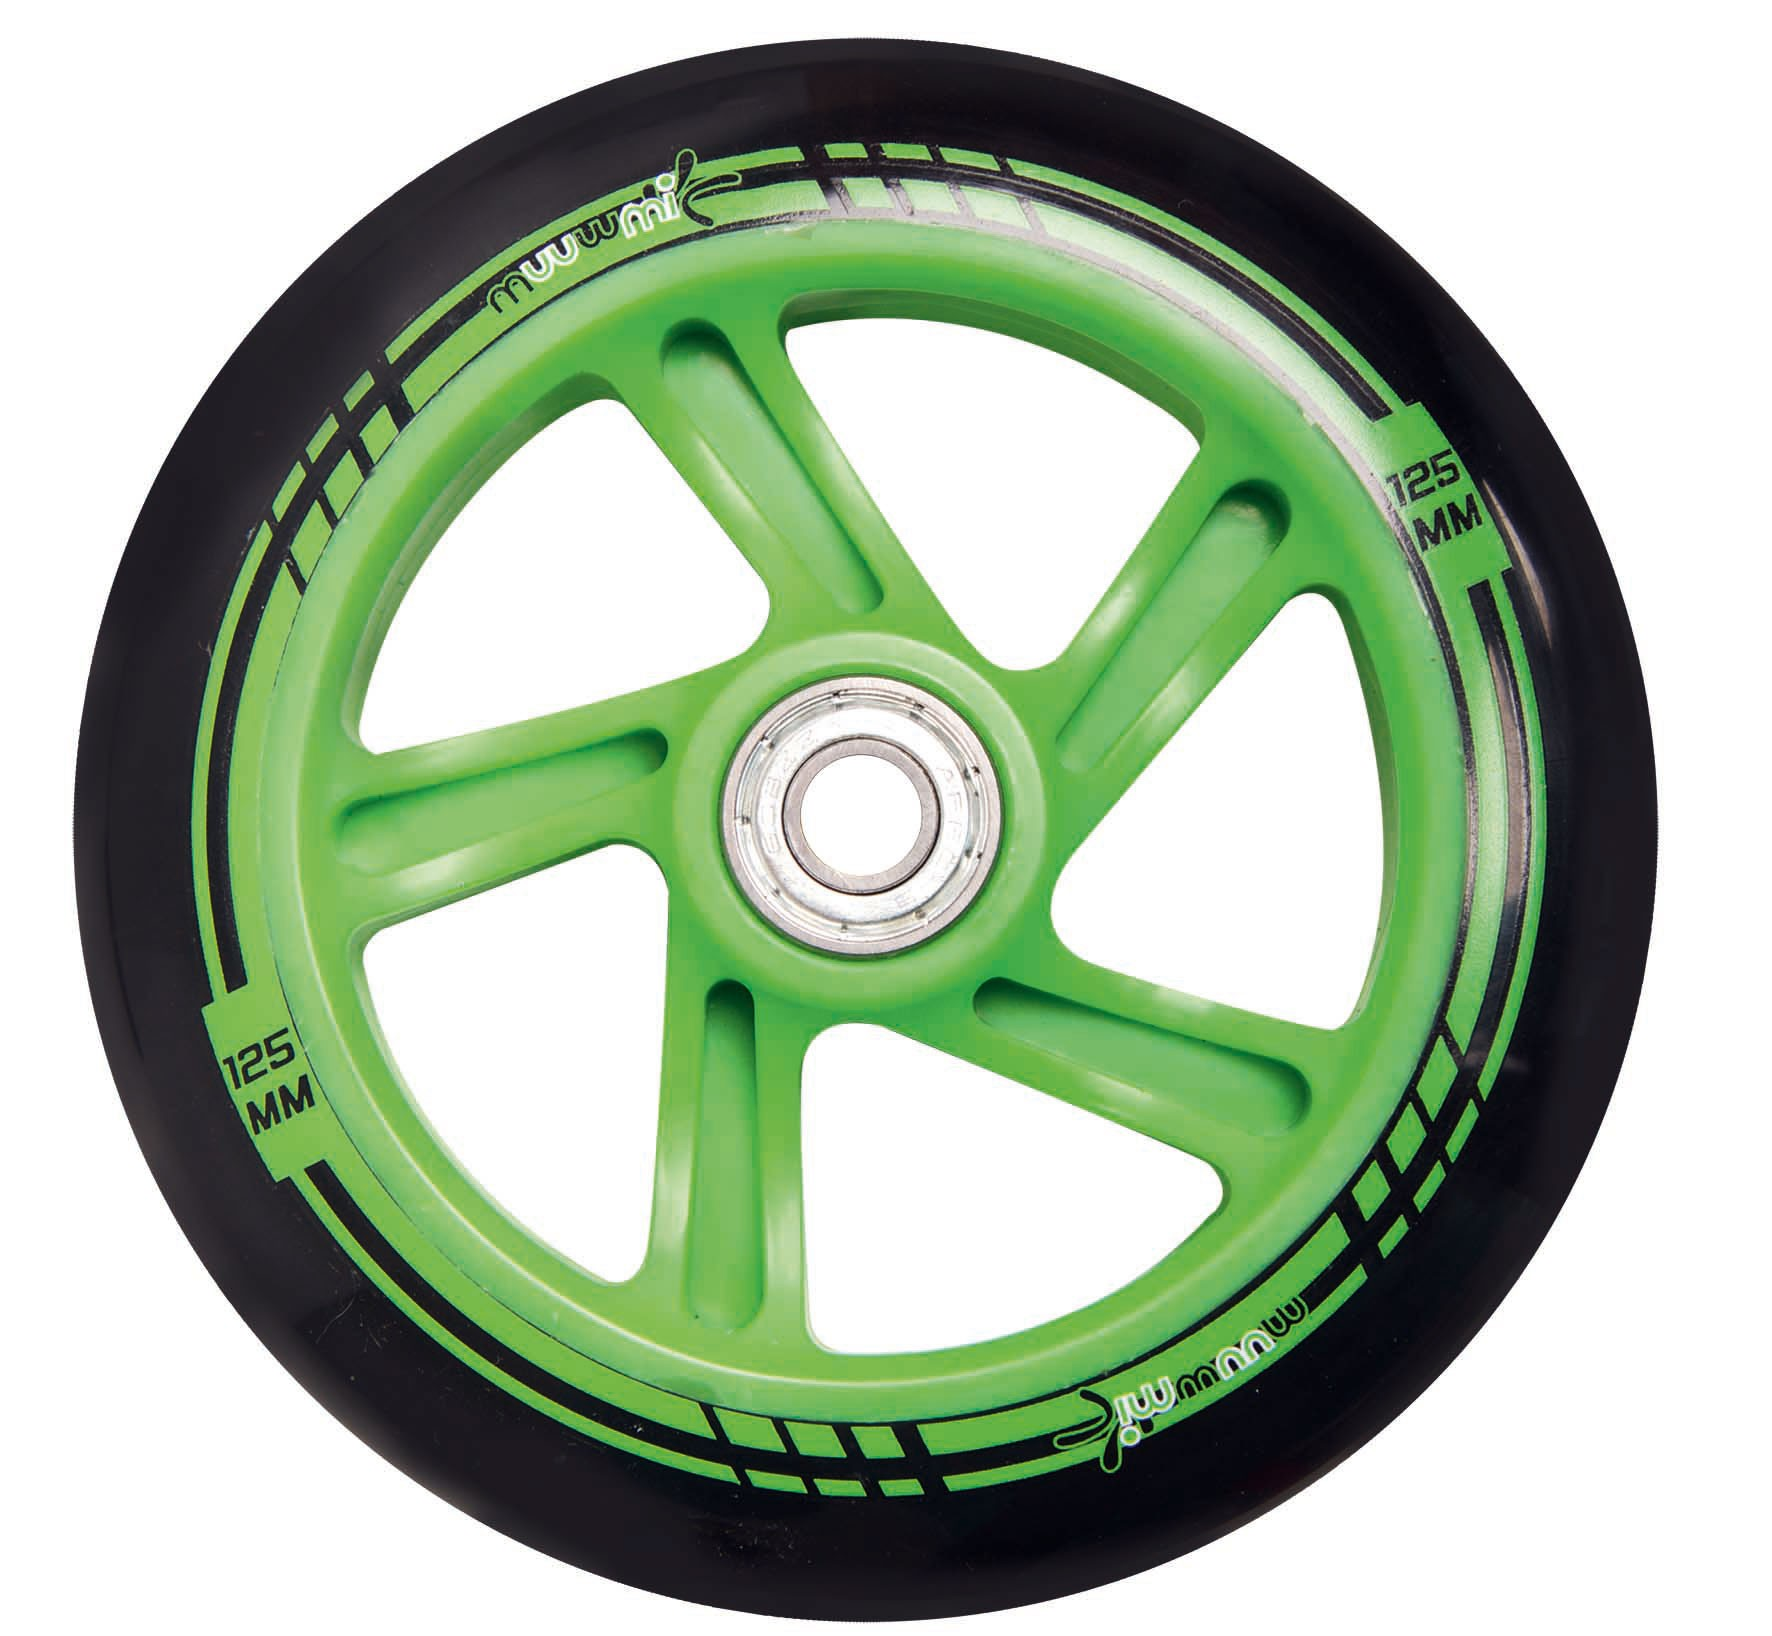 Alu Scooter / Cityroller Muuwmi 125mm schwarz-grün Bild 4